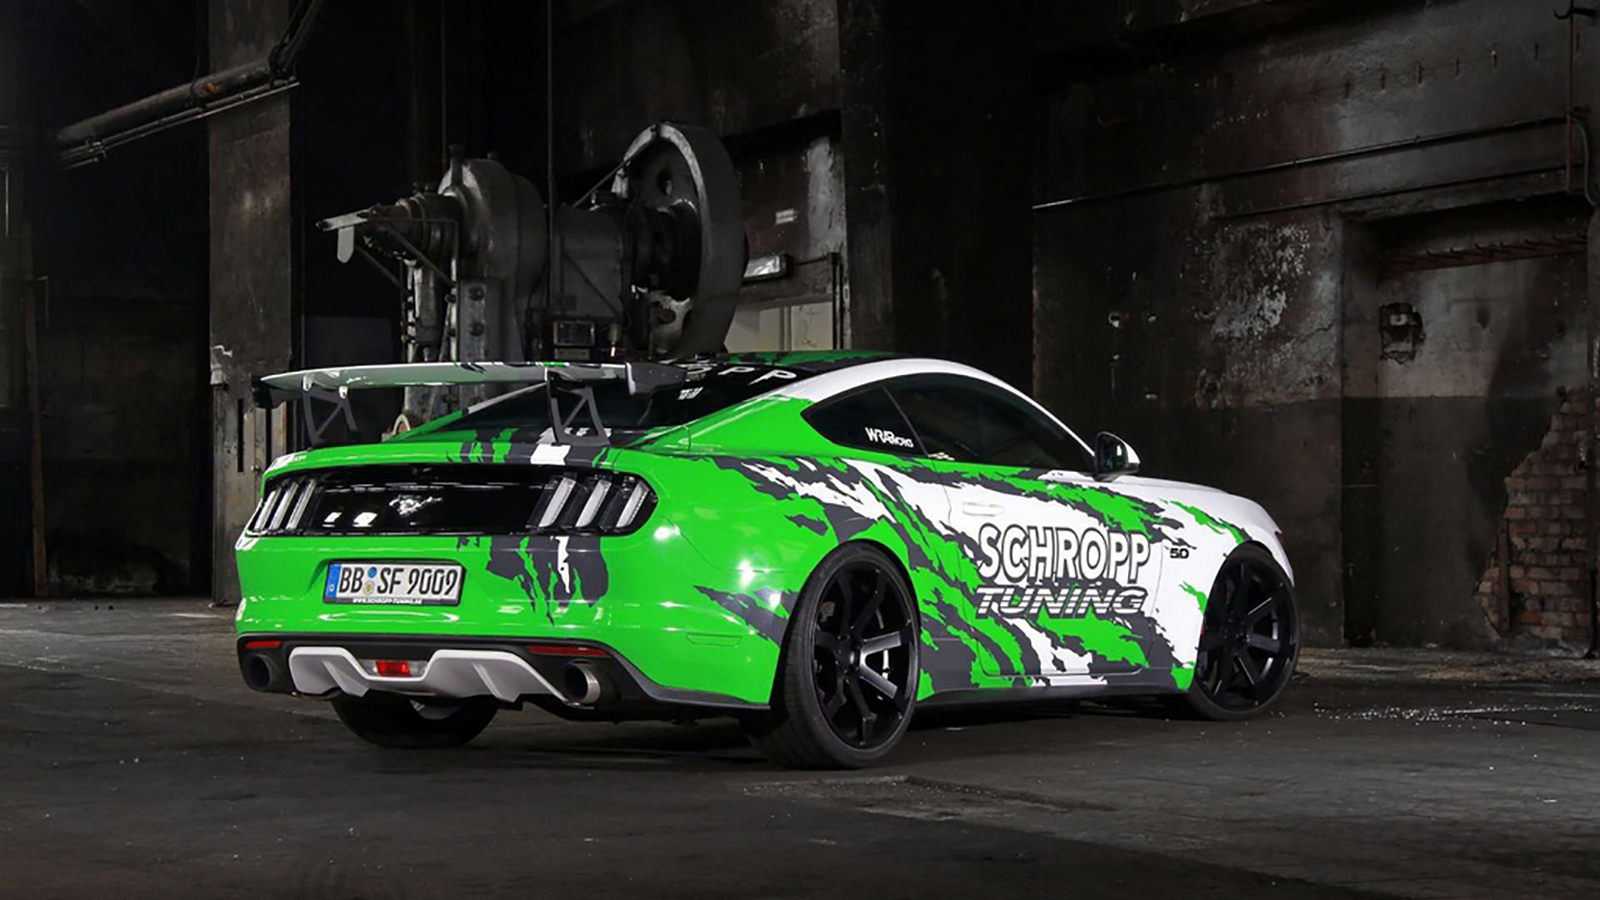 Ford Mustang Schropp Tuning